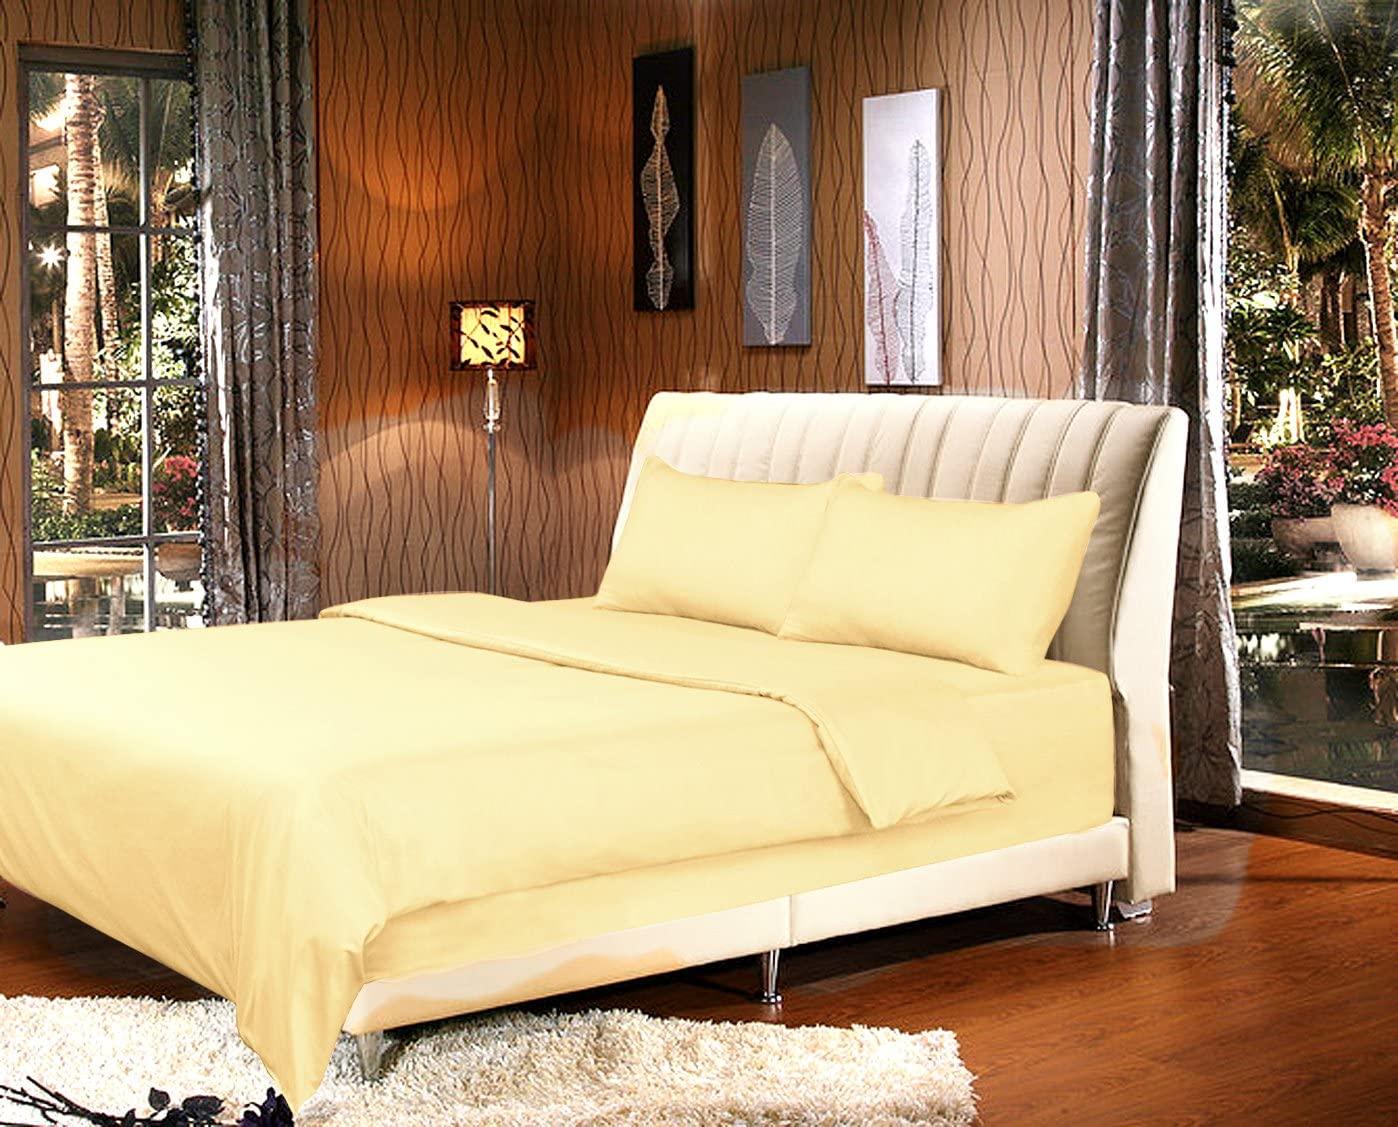 Tache Home Fashion Sunny Yellow Duvet Cover, Cal King